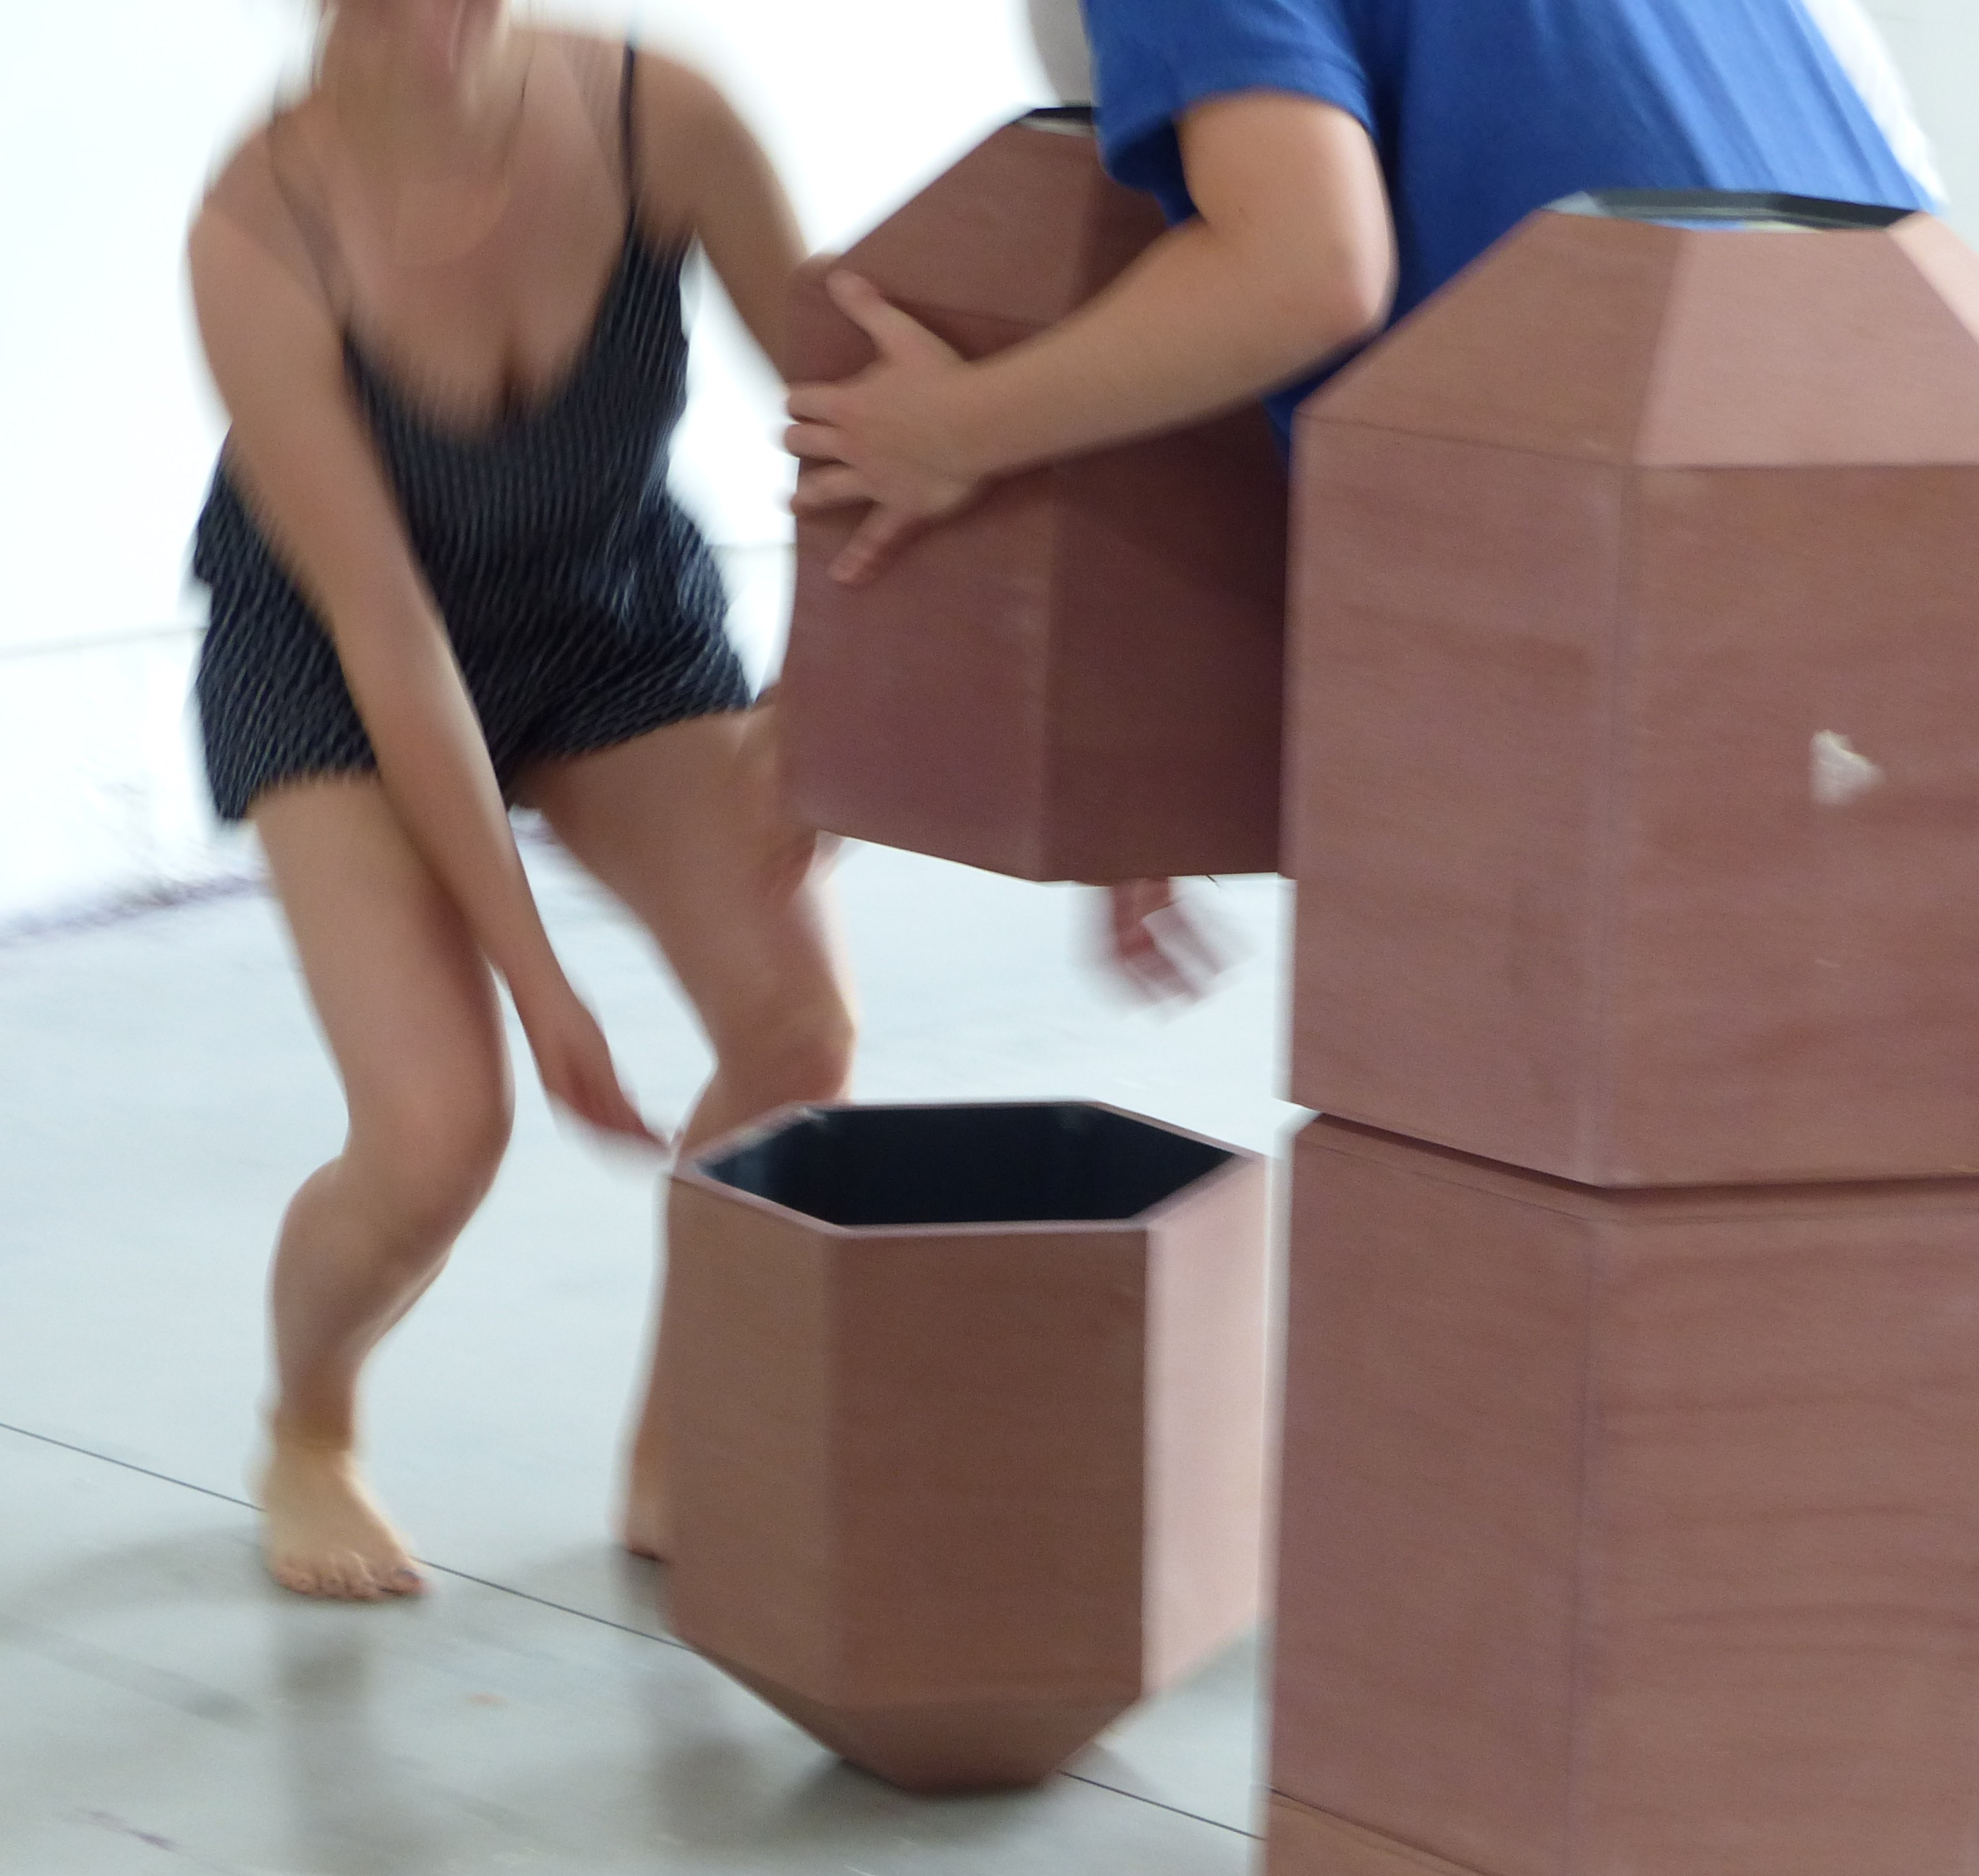 La construction du donjon proportion 2/3